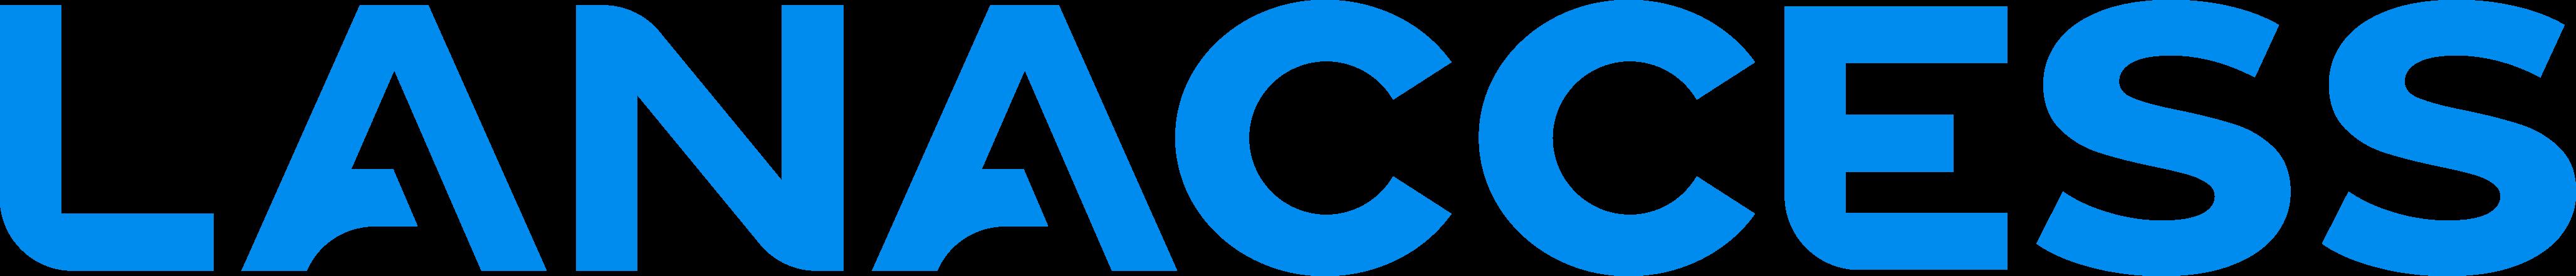 Lanaccess - Proveedores Telecomunicaciones